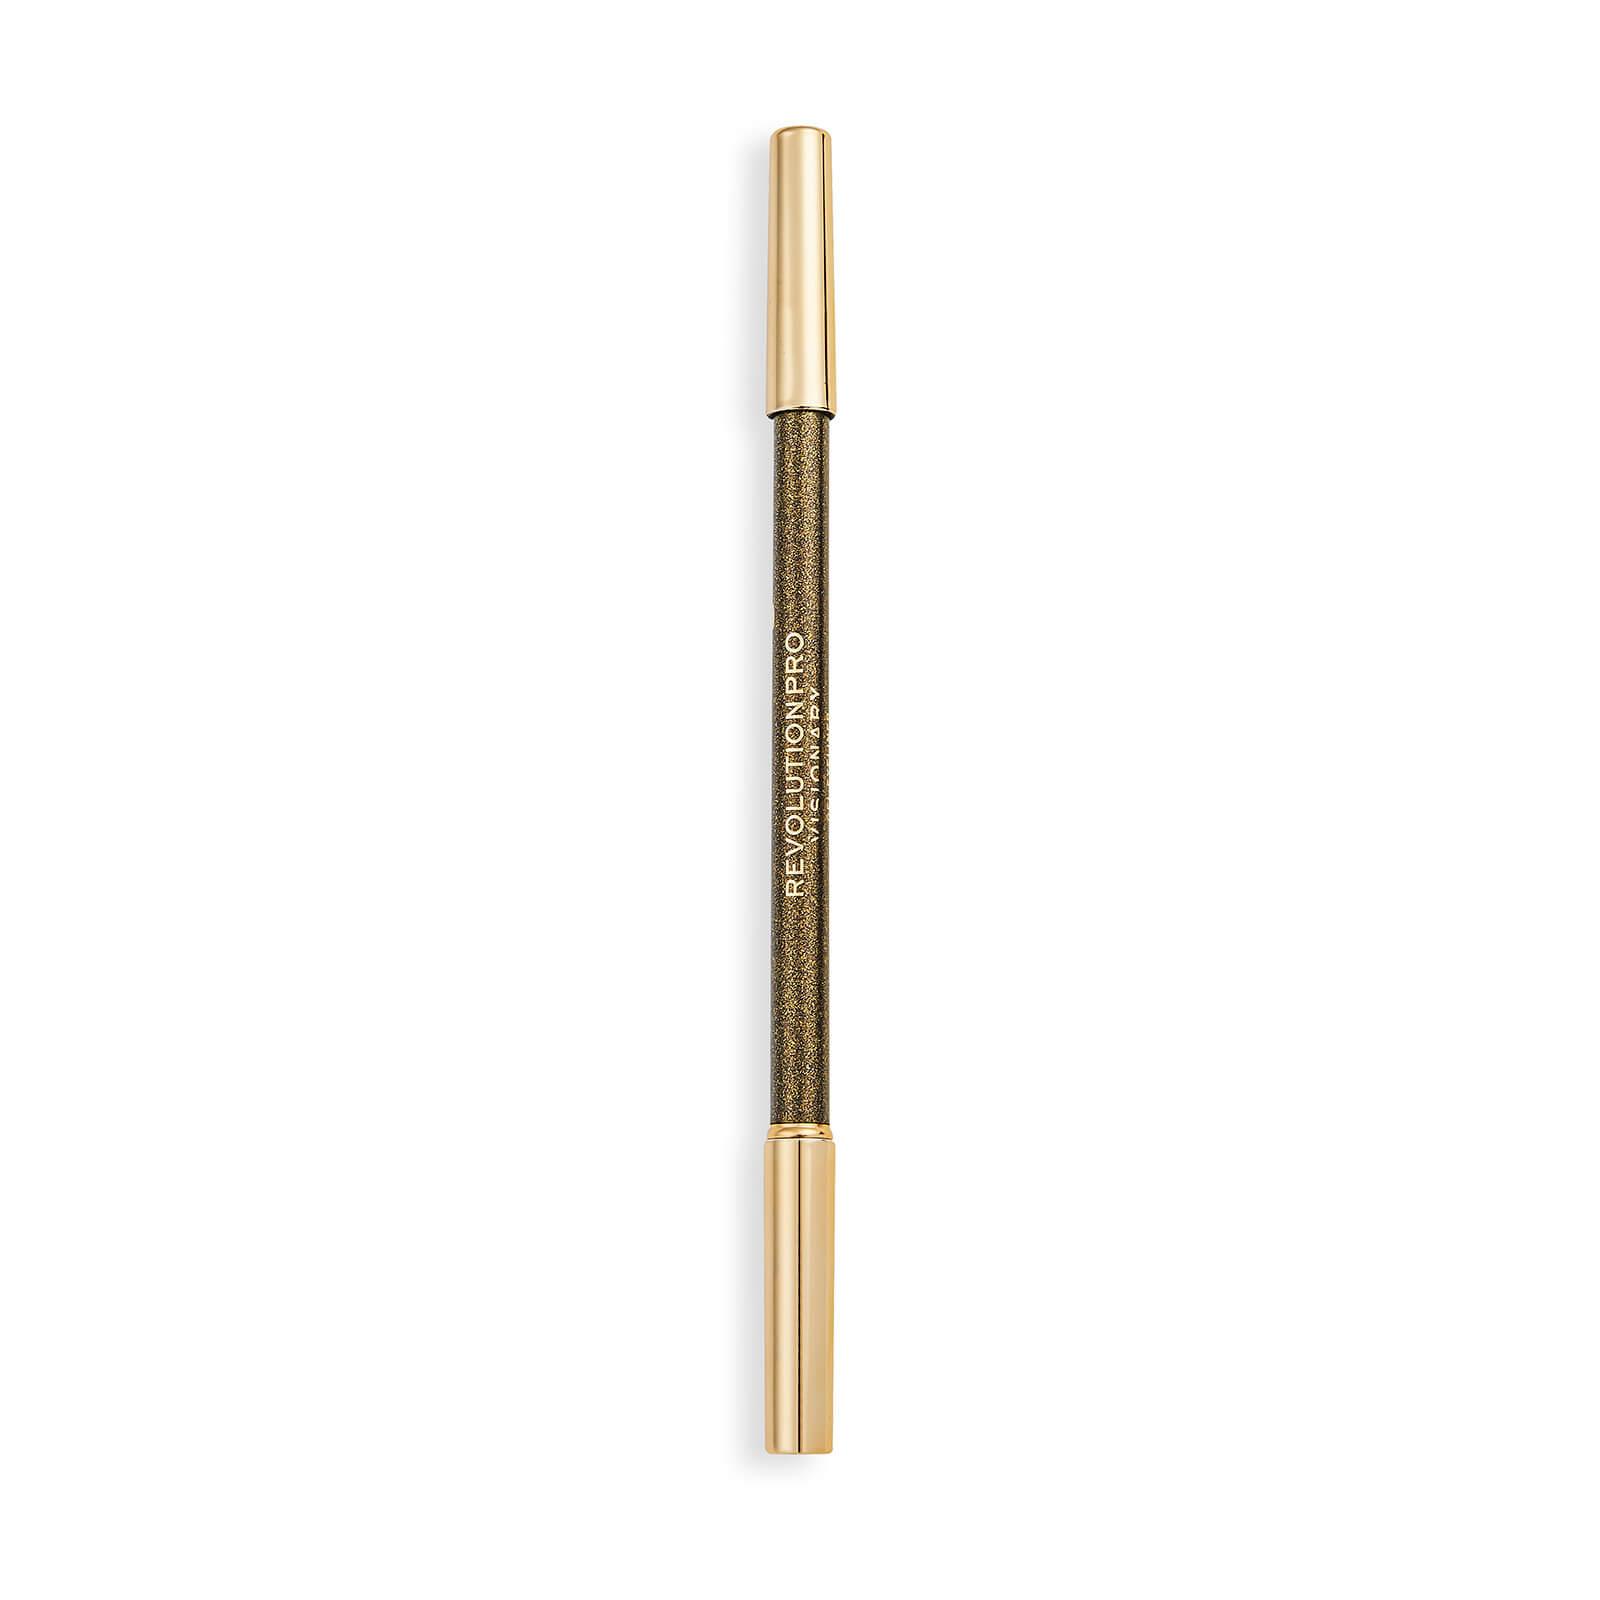 Купить Revolution Pro Visionary Gel Eyeliner Pencil Starry